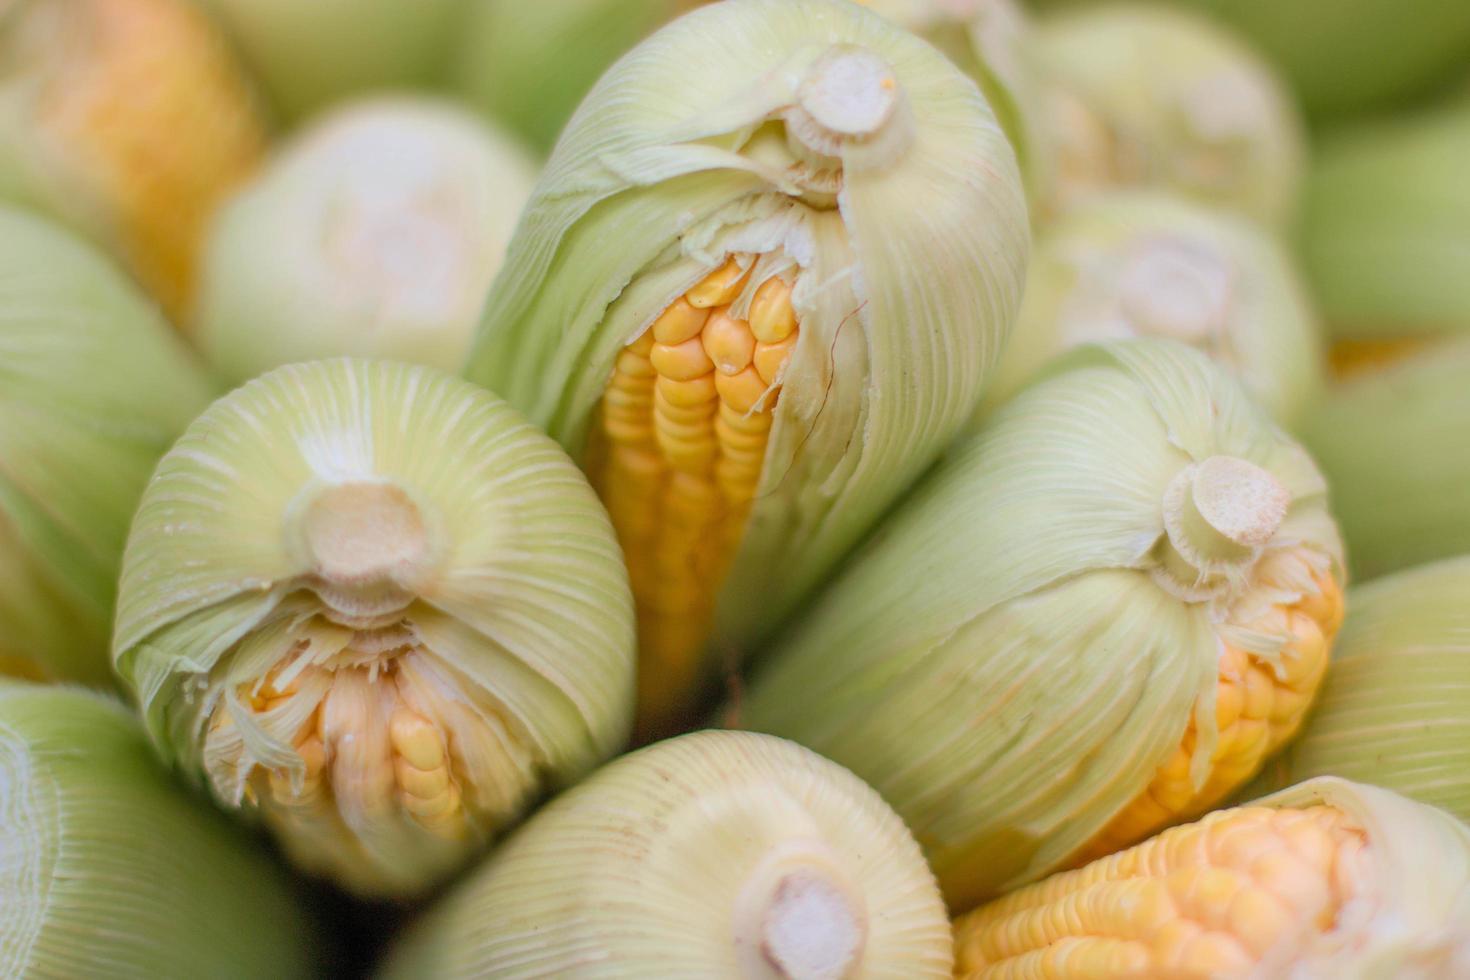 Yellow ears of corn photo